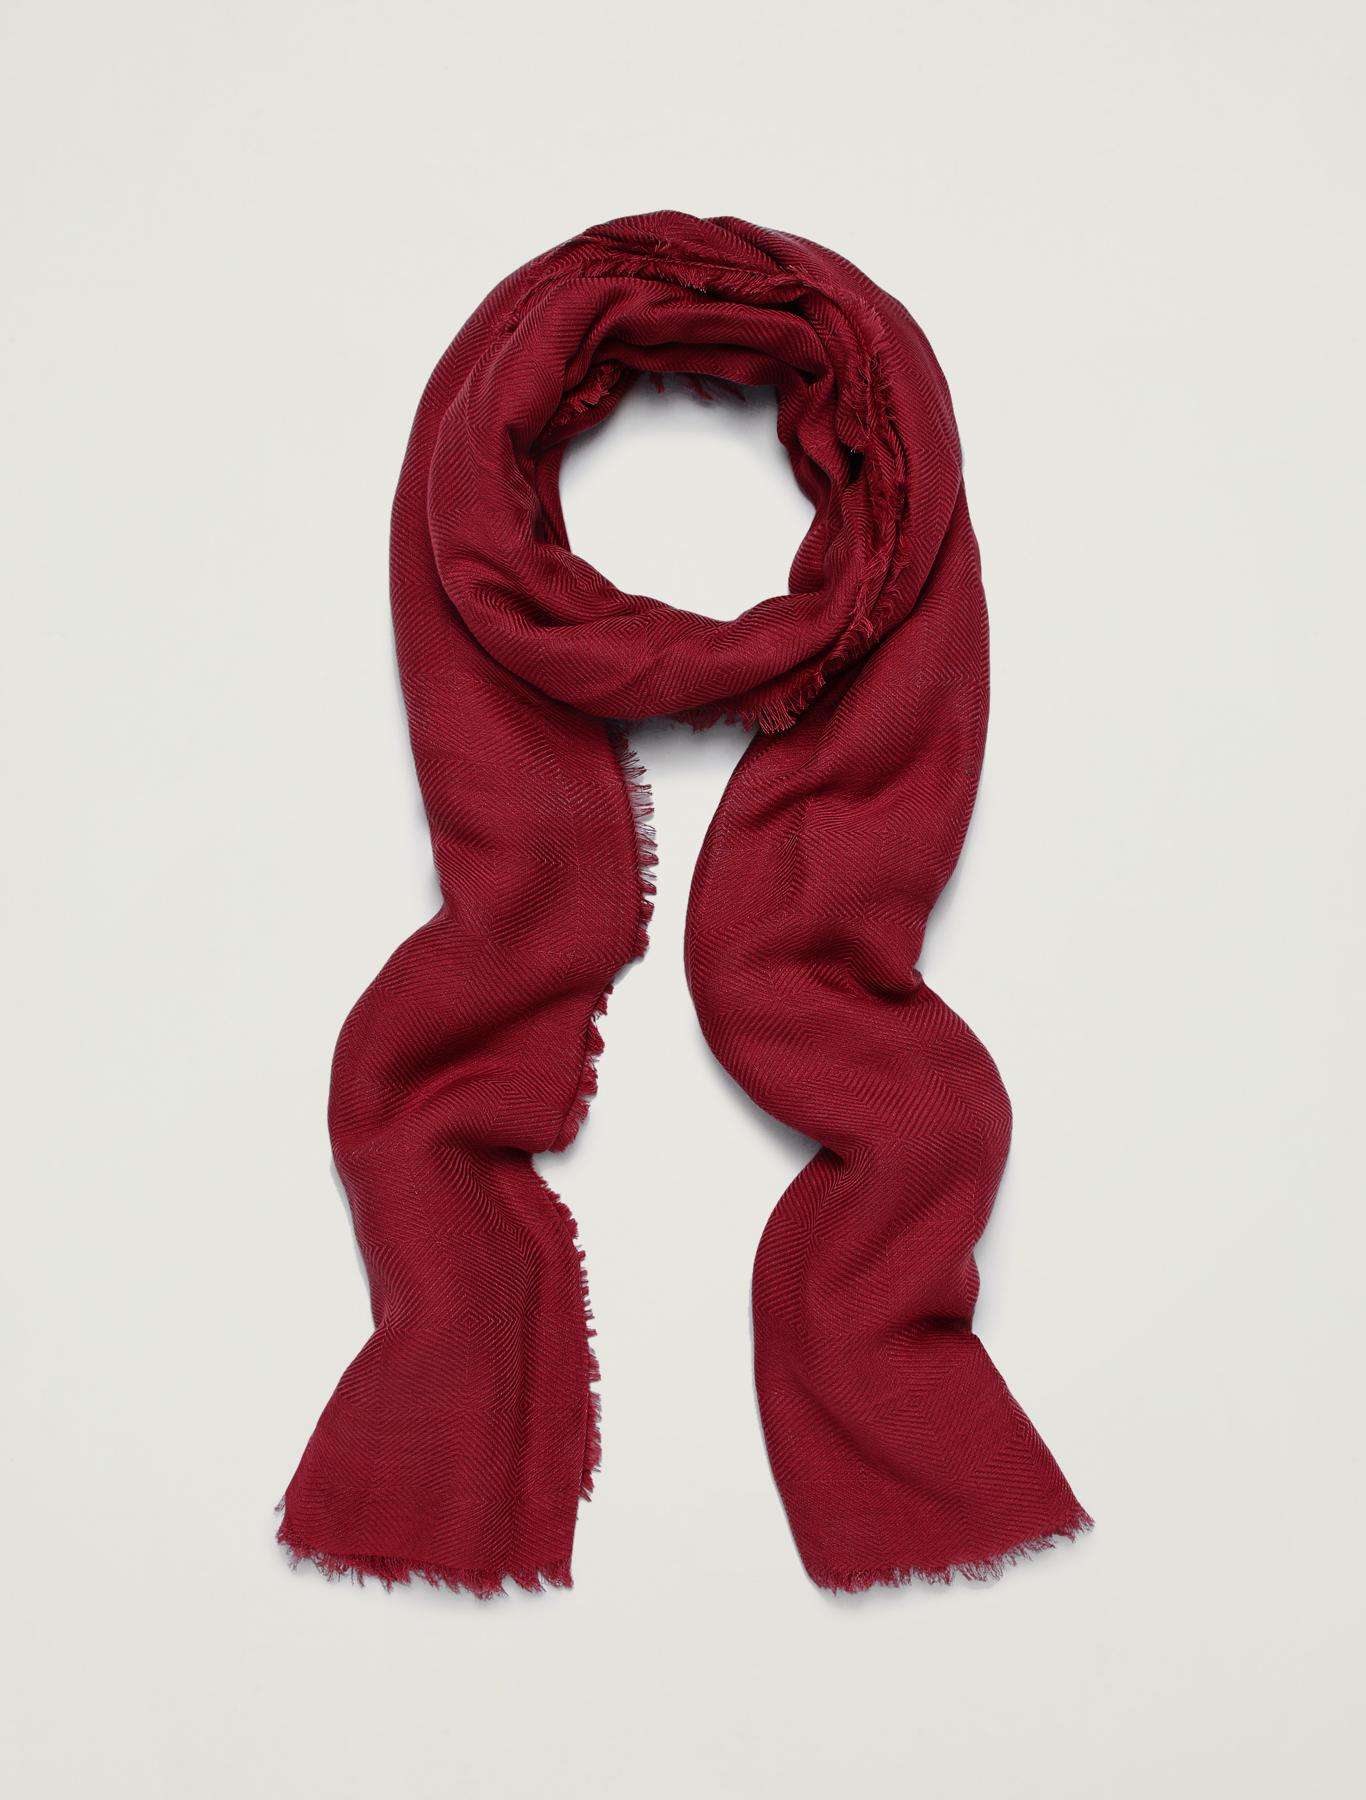 Jacquard scarf - red - pennyblack